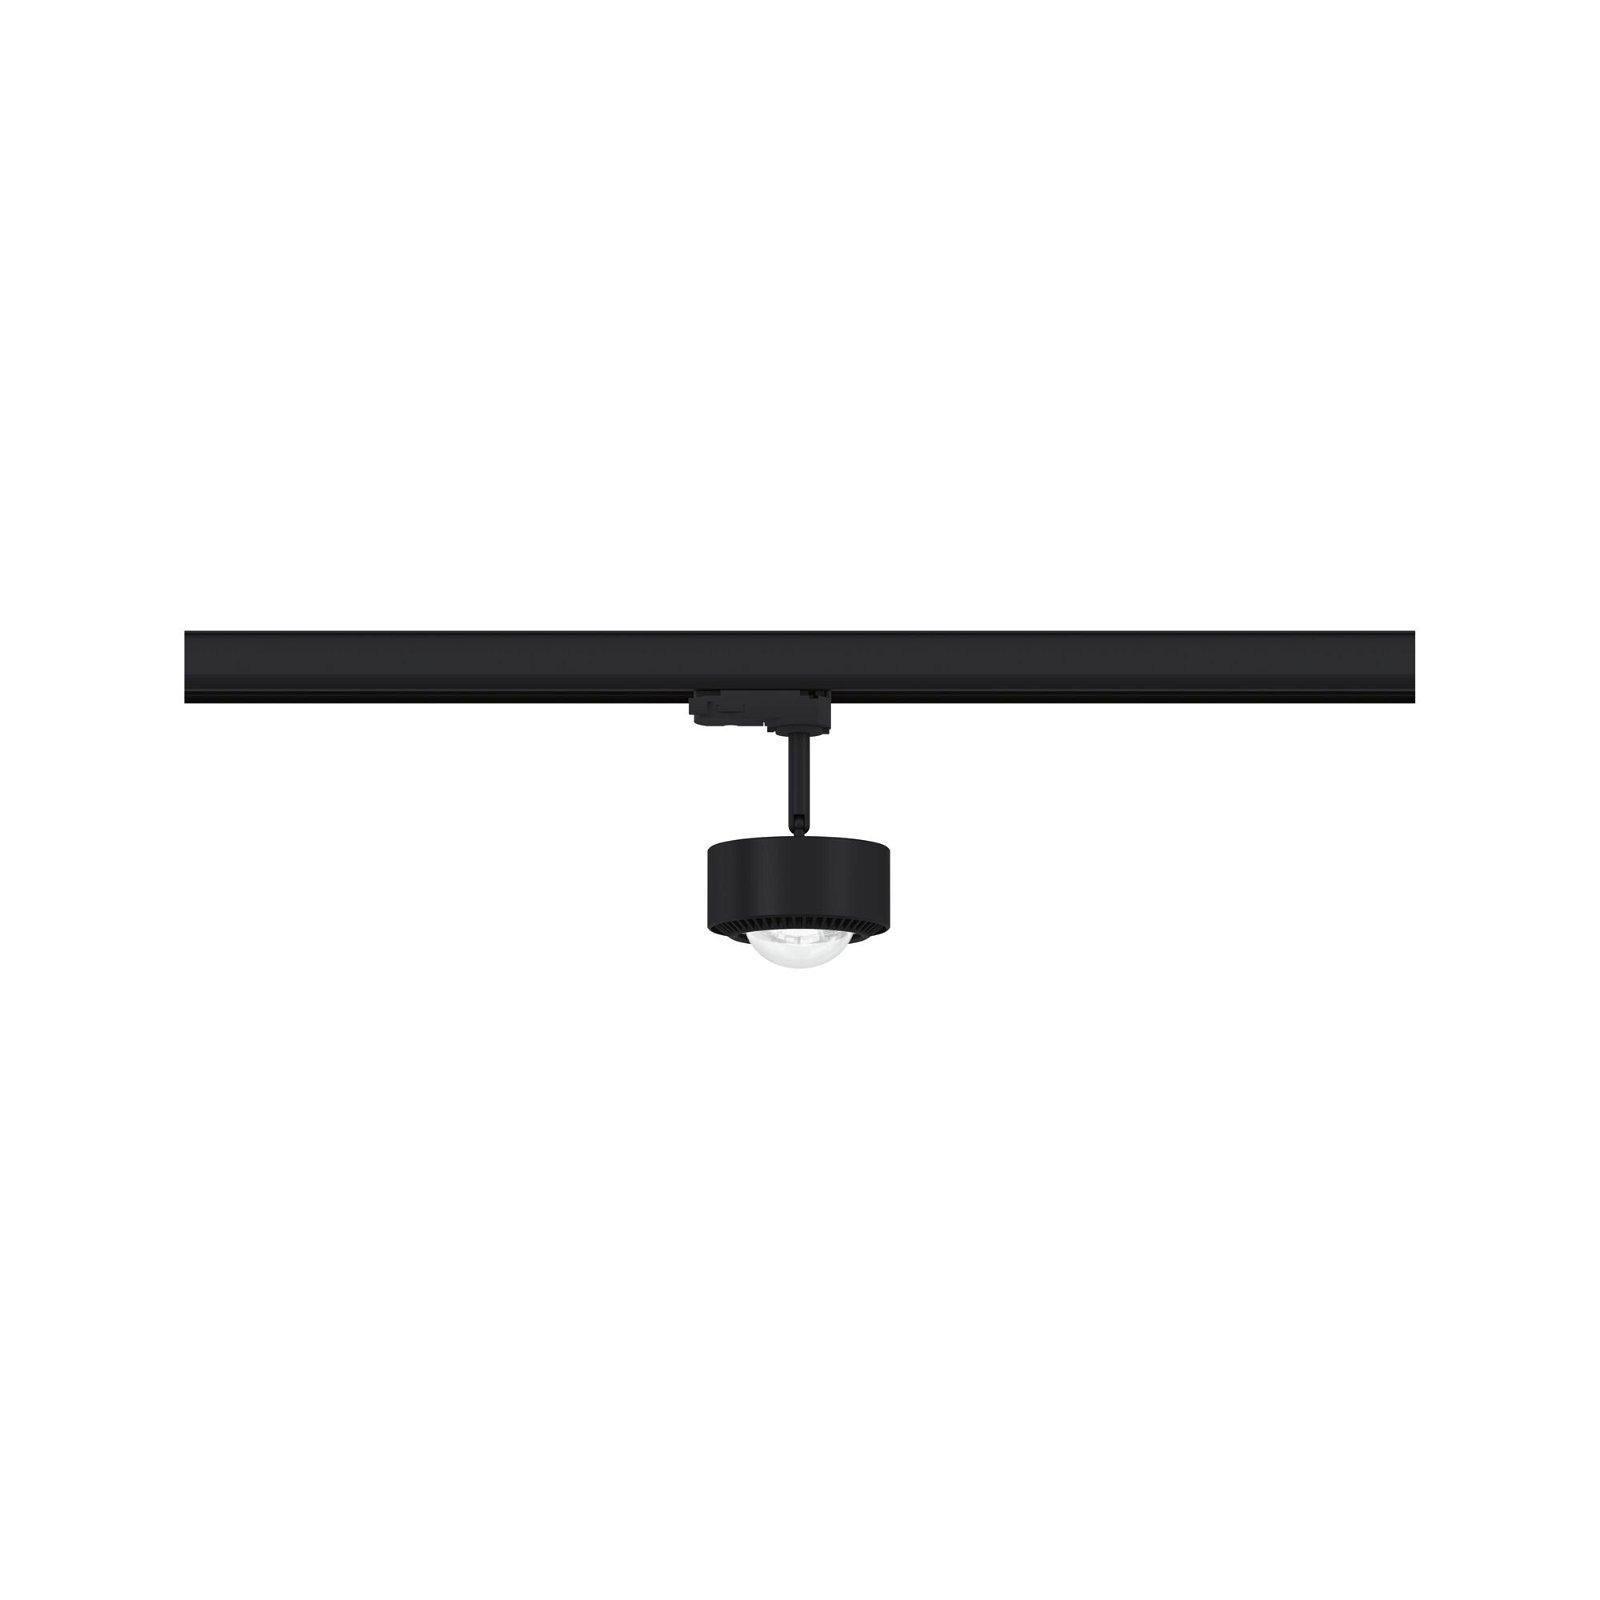 ProRail3 LED Schienenspot Aldan 800lm 8,2W 4000K 230V Schwarz/Chrom